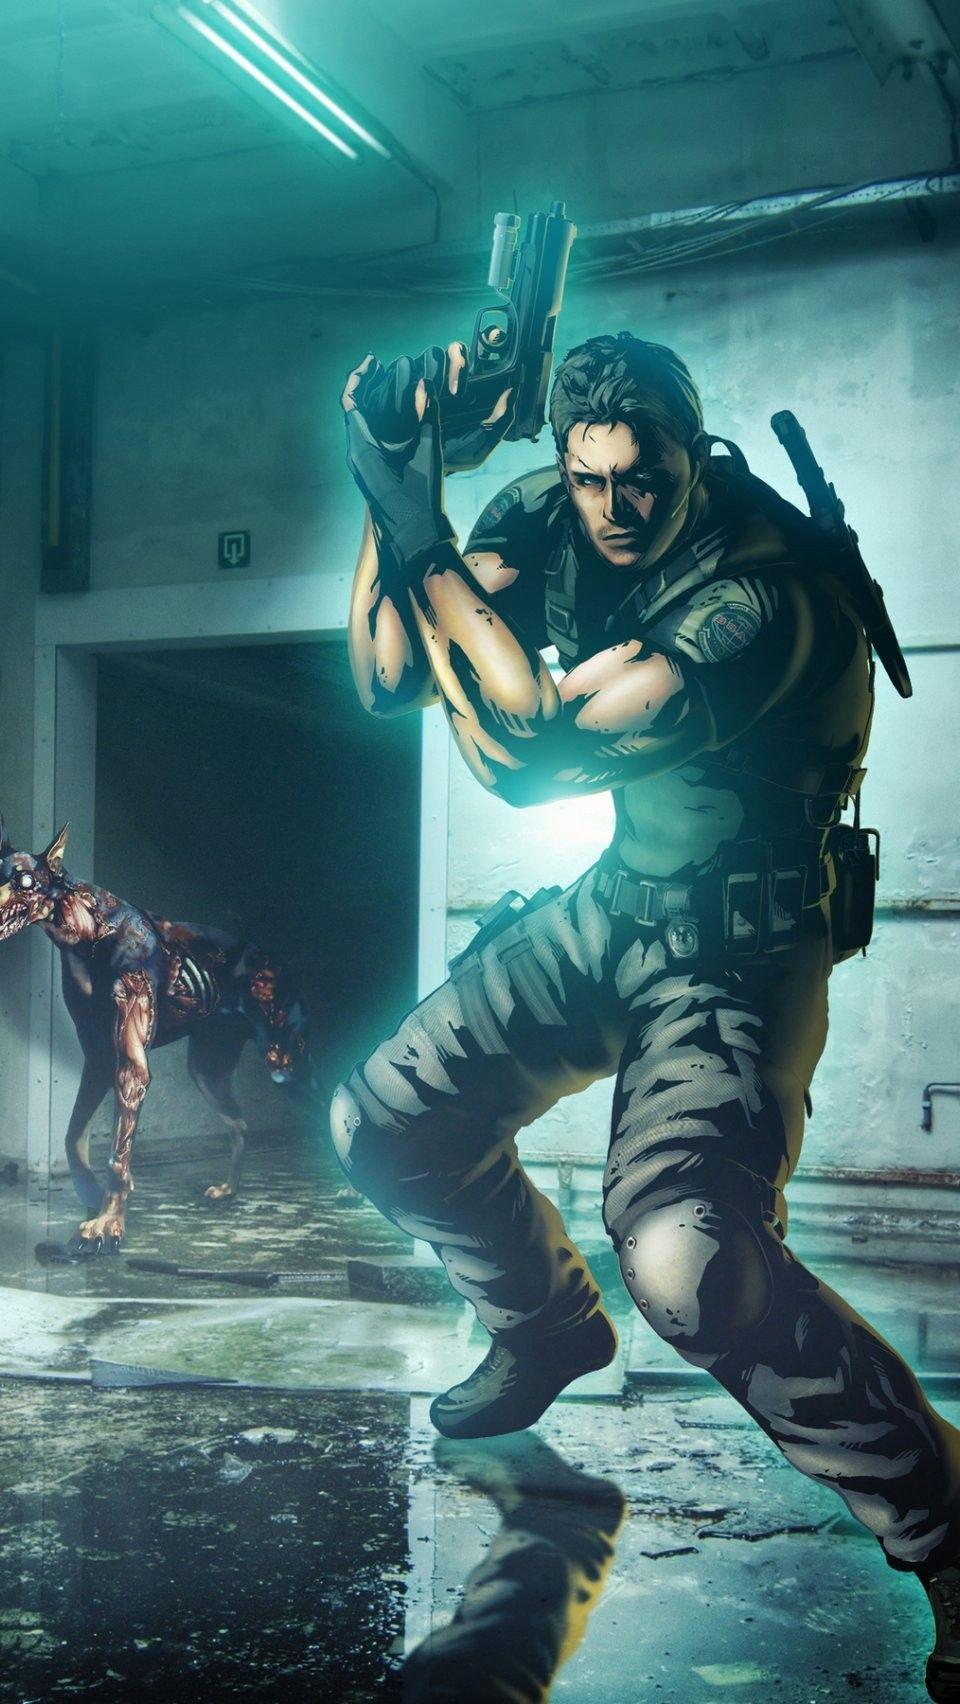 Chris Redfield Marvel vs Capcom 3 iPhone 6 wallpaper - Resident Evil iPhone 6 Wallpapers ...